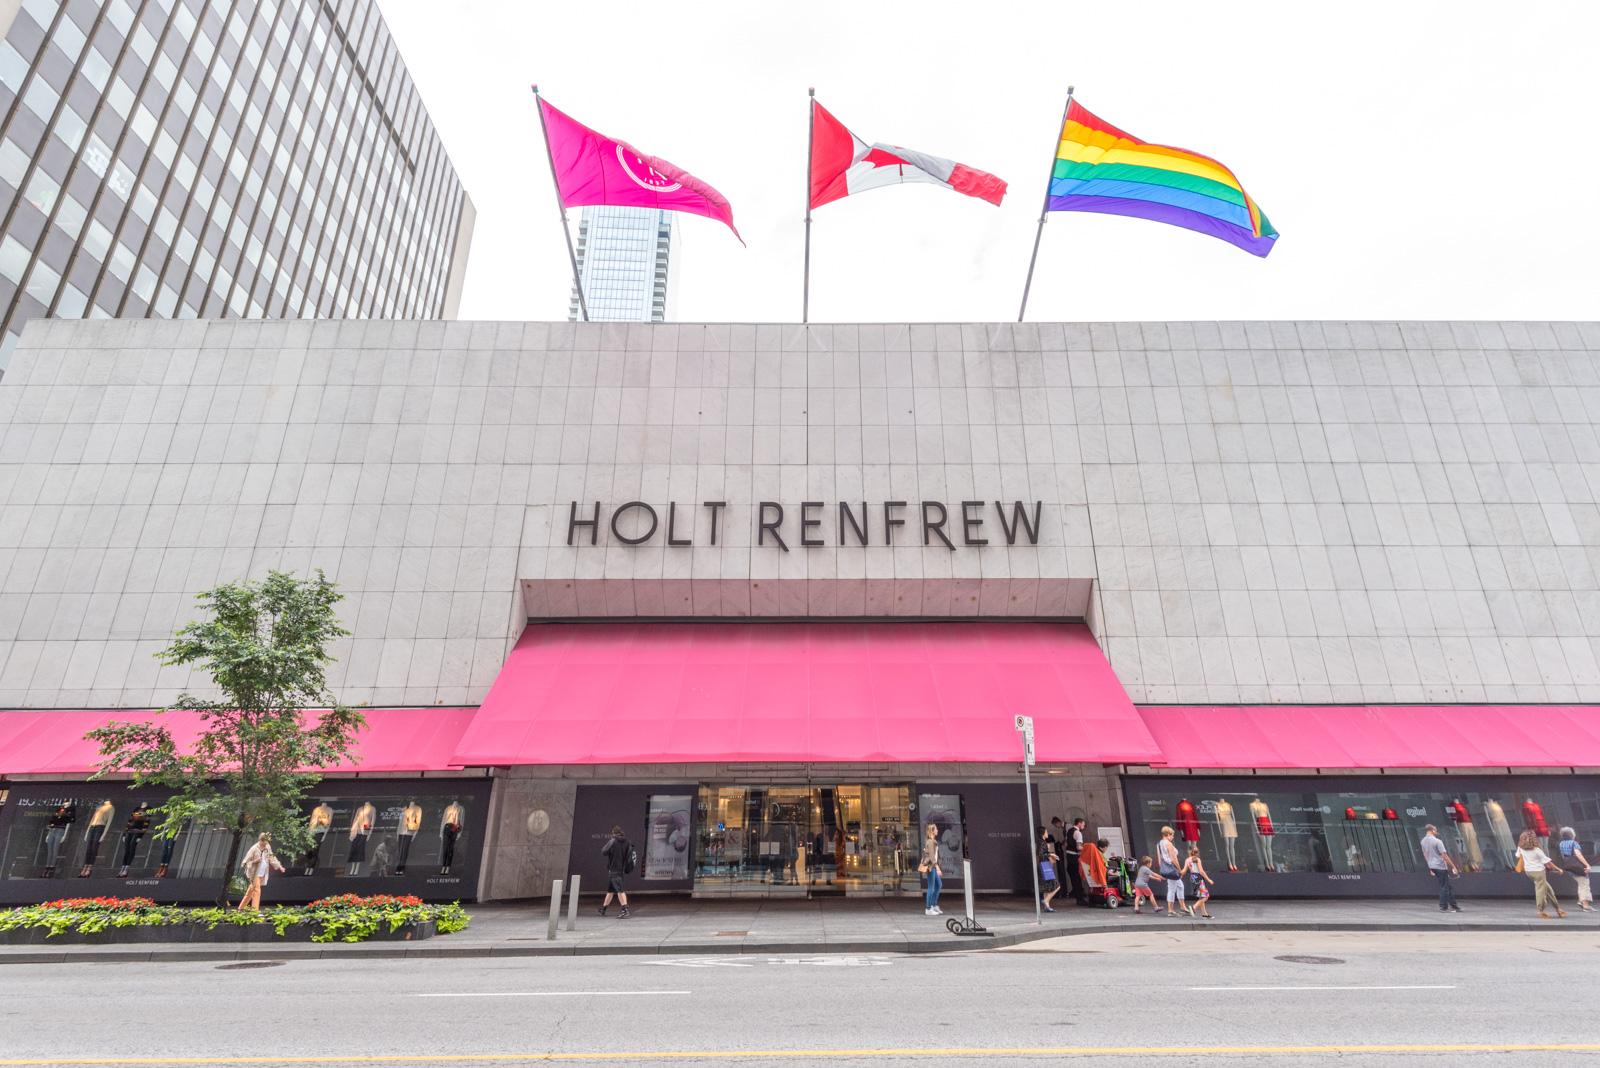 Holt Renfrew facade in Toronto.